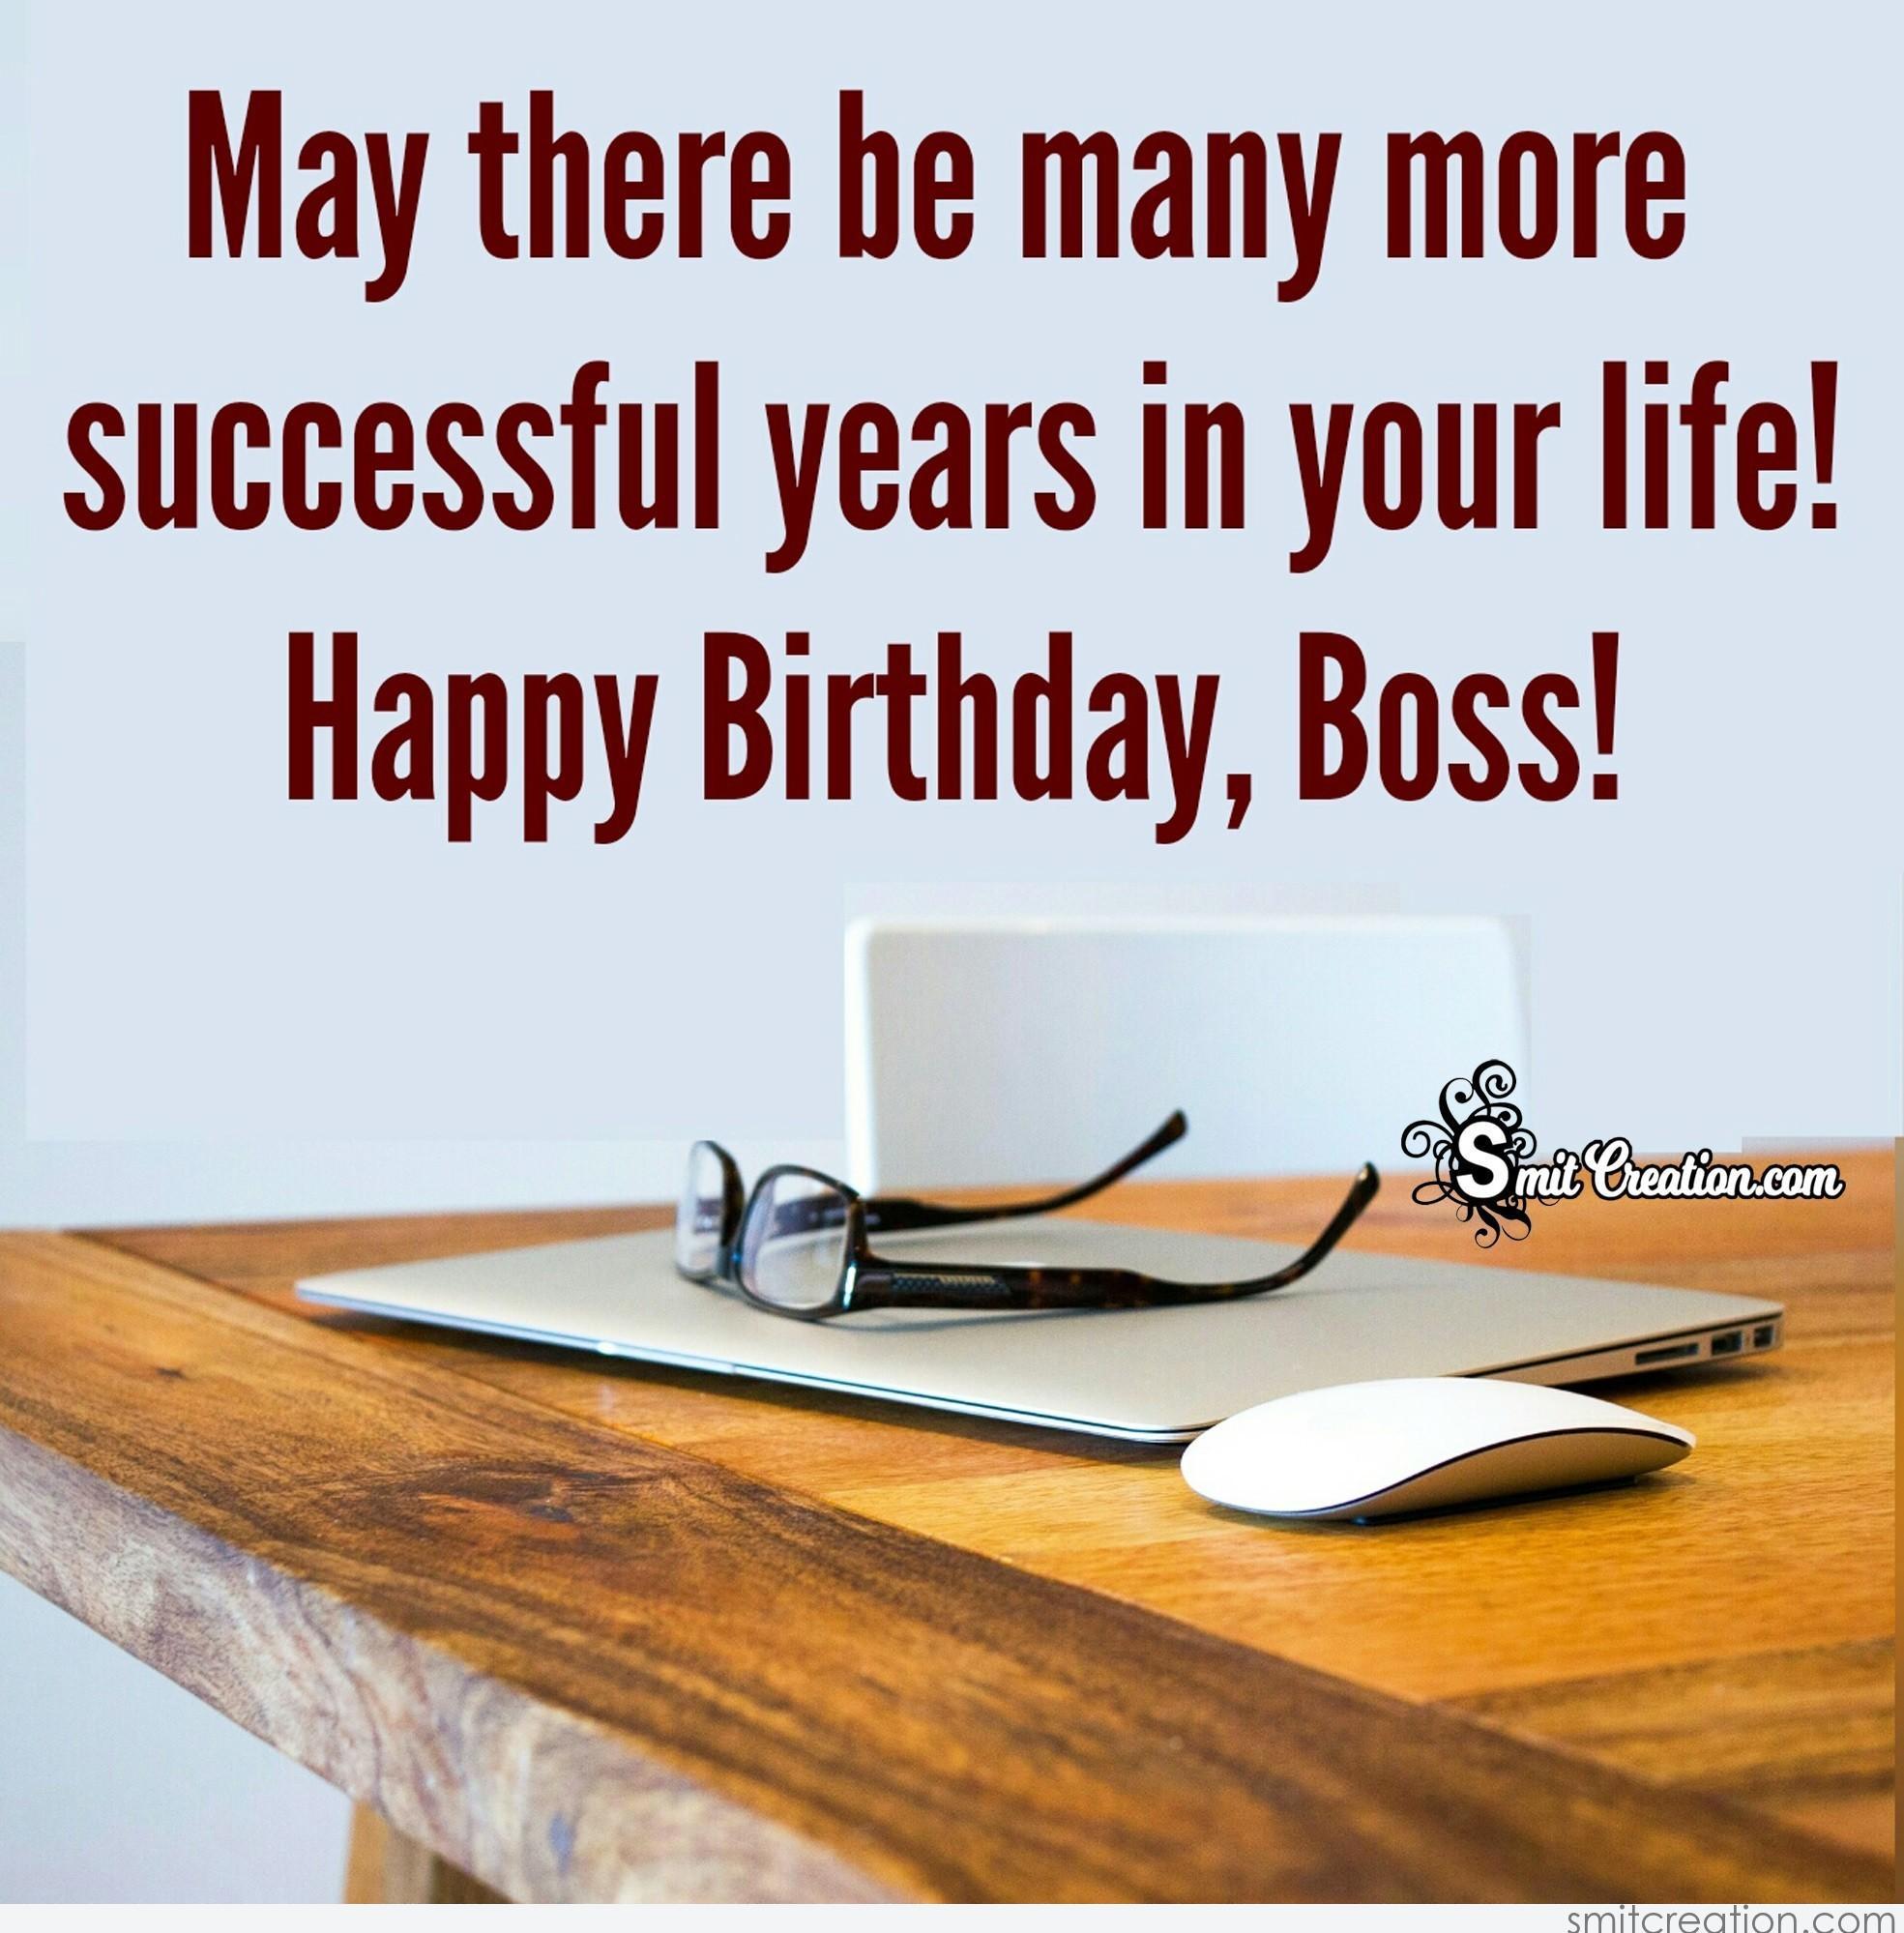 Birthday Wishes For Boss Man ~ Happy birthday boss smitcreation